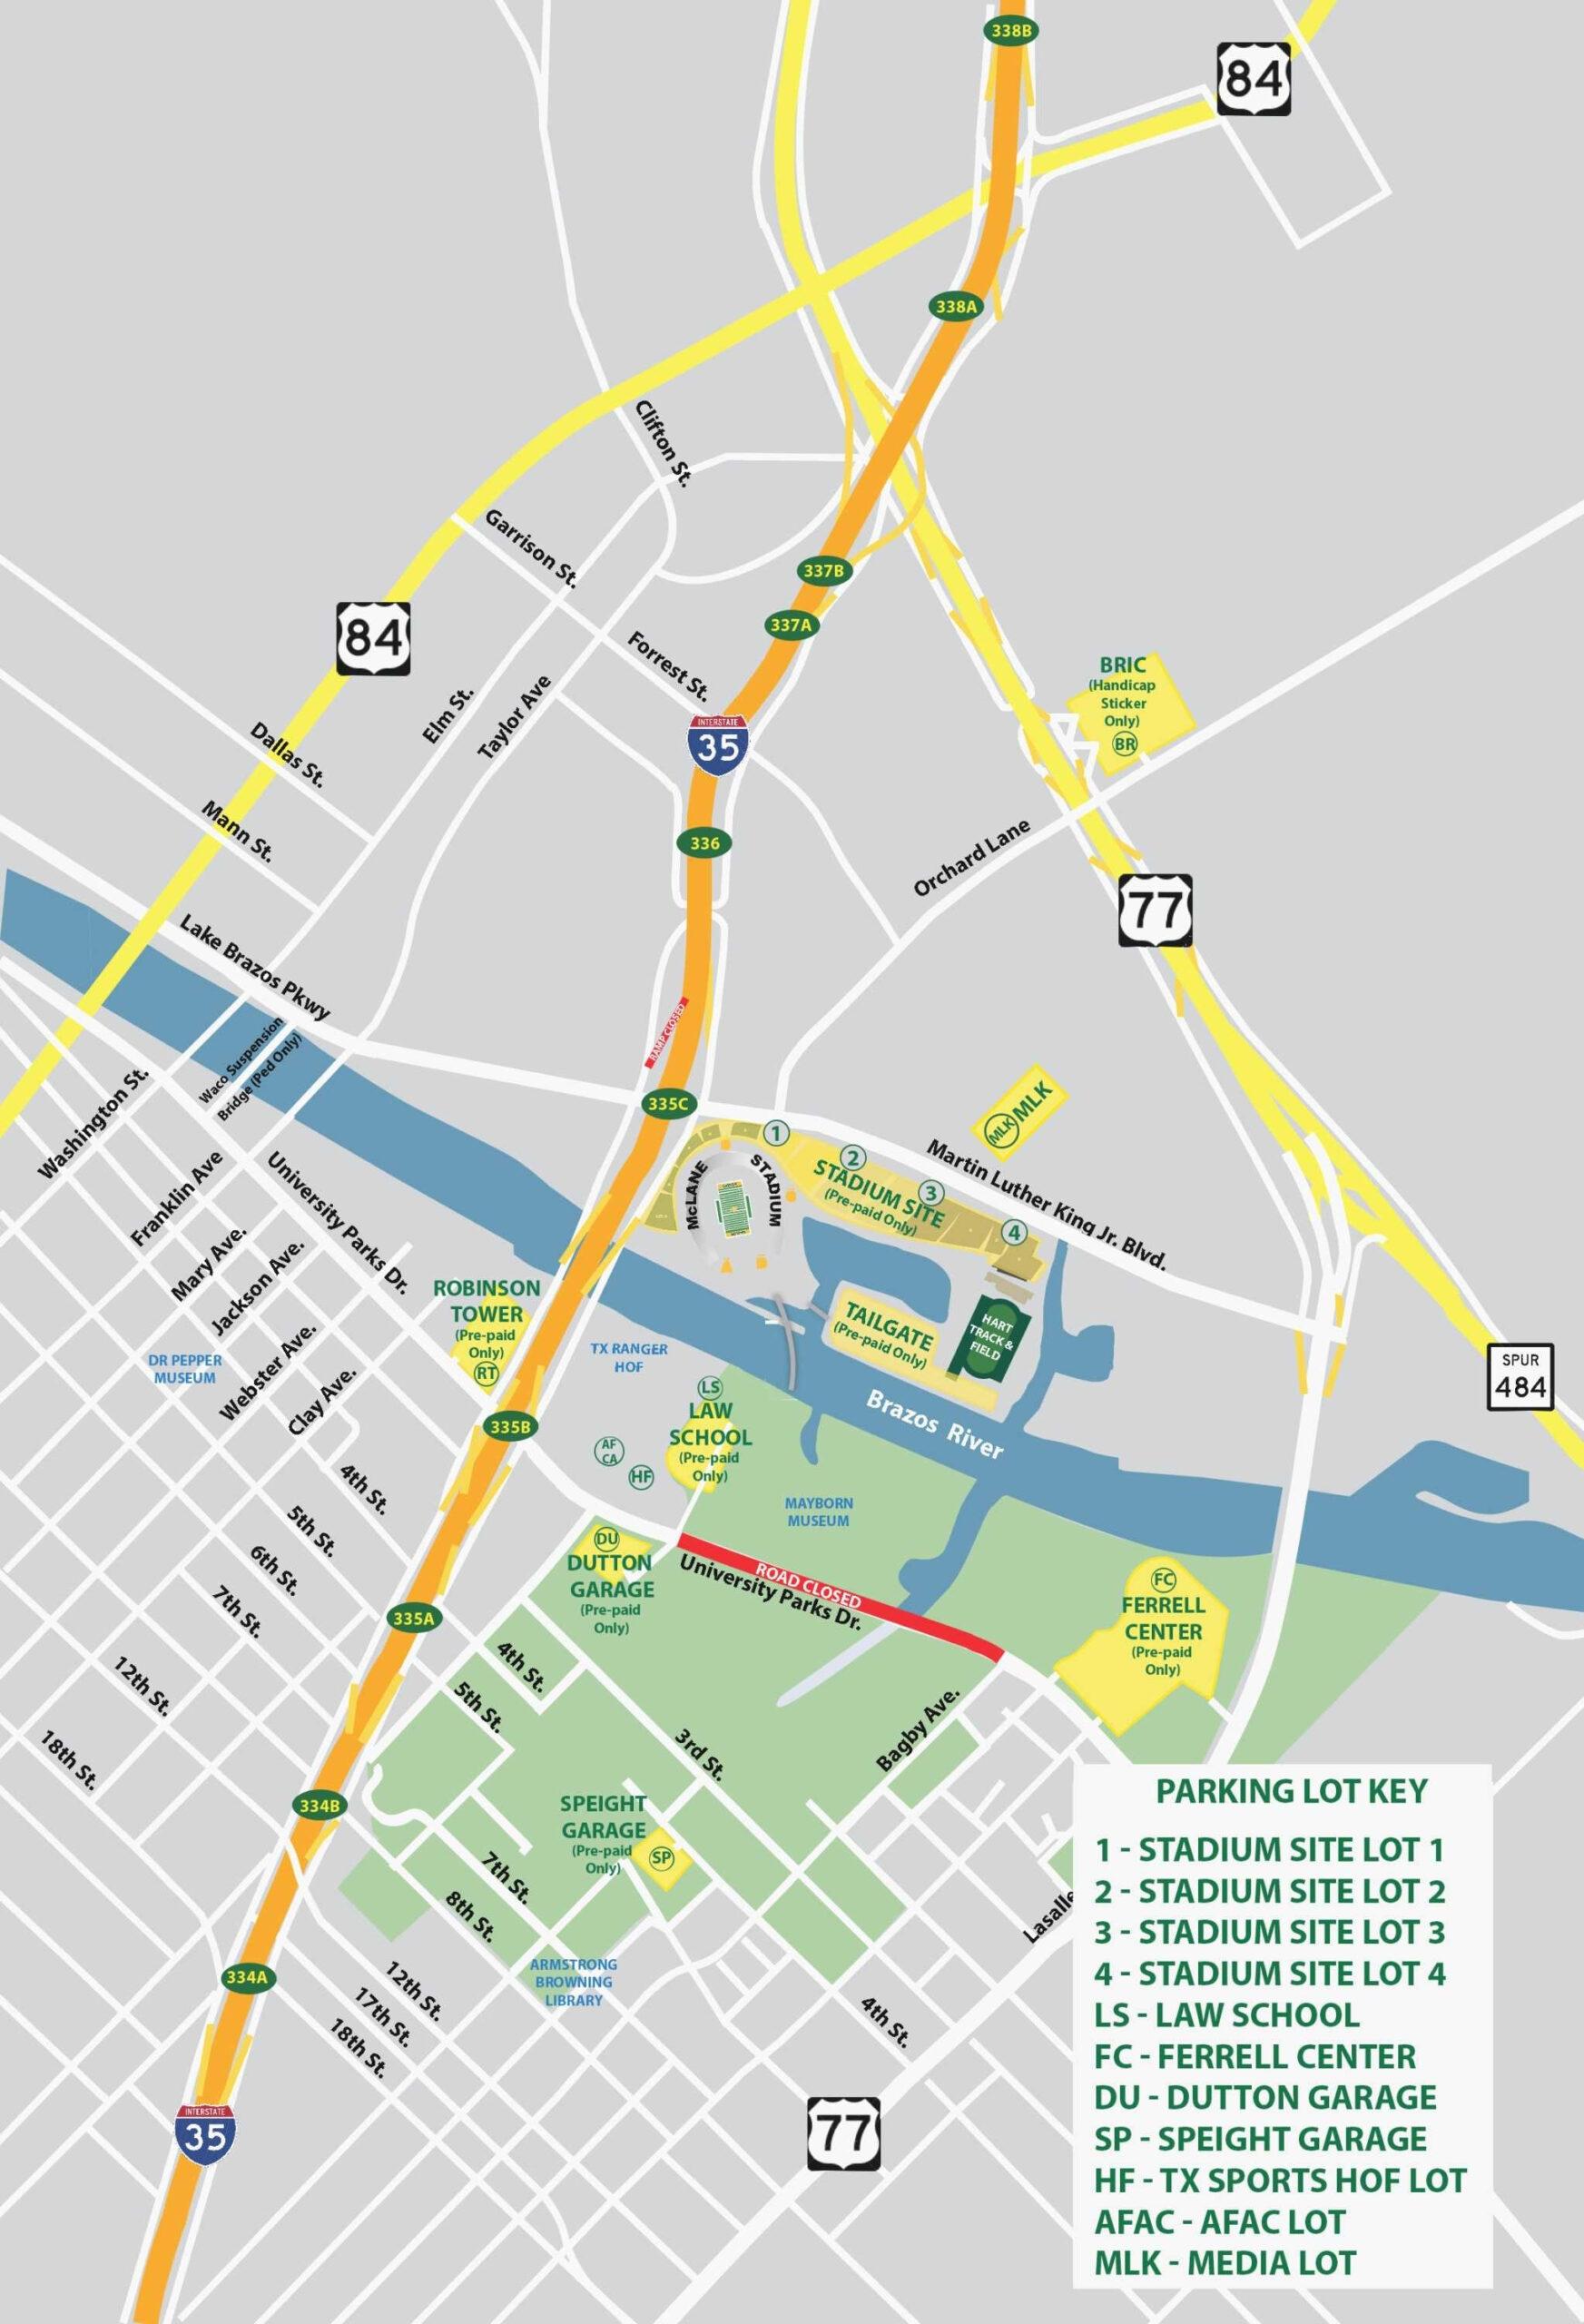 Nyc Parking Map Alternate Side  Calendar Inspiration Design pertaining to Alternate Side Parking Suspension 2021